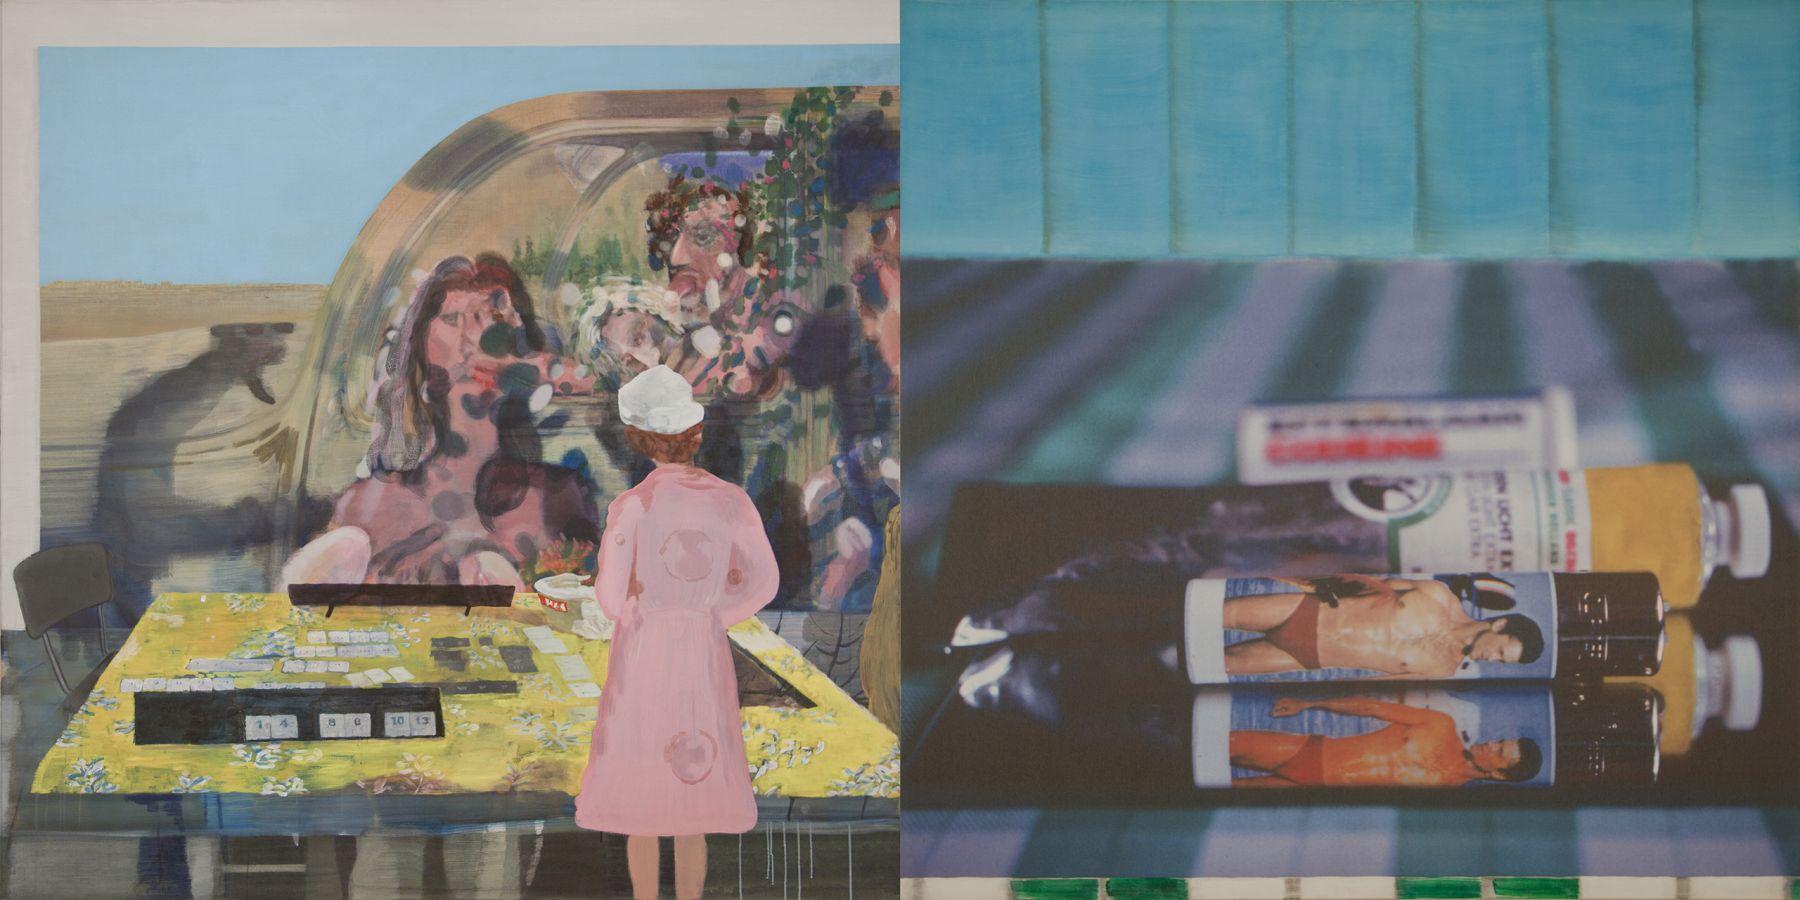 26. A Game, 2006-2008, acrylic/tempera/oil/print/canvas, 200 x 400 cm